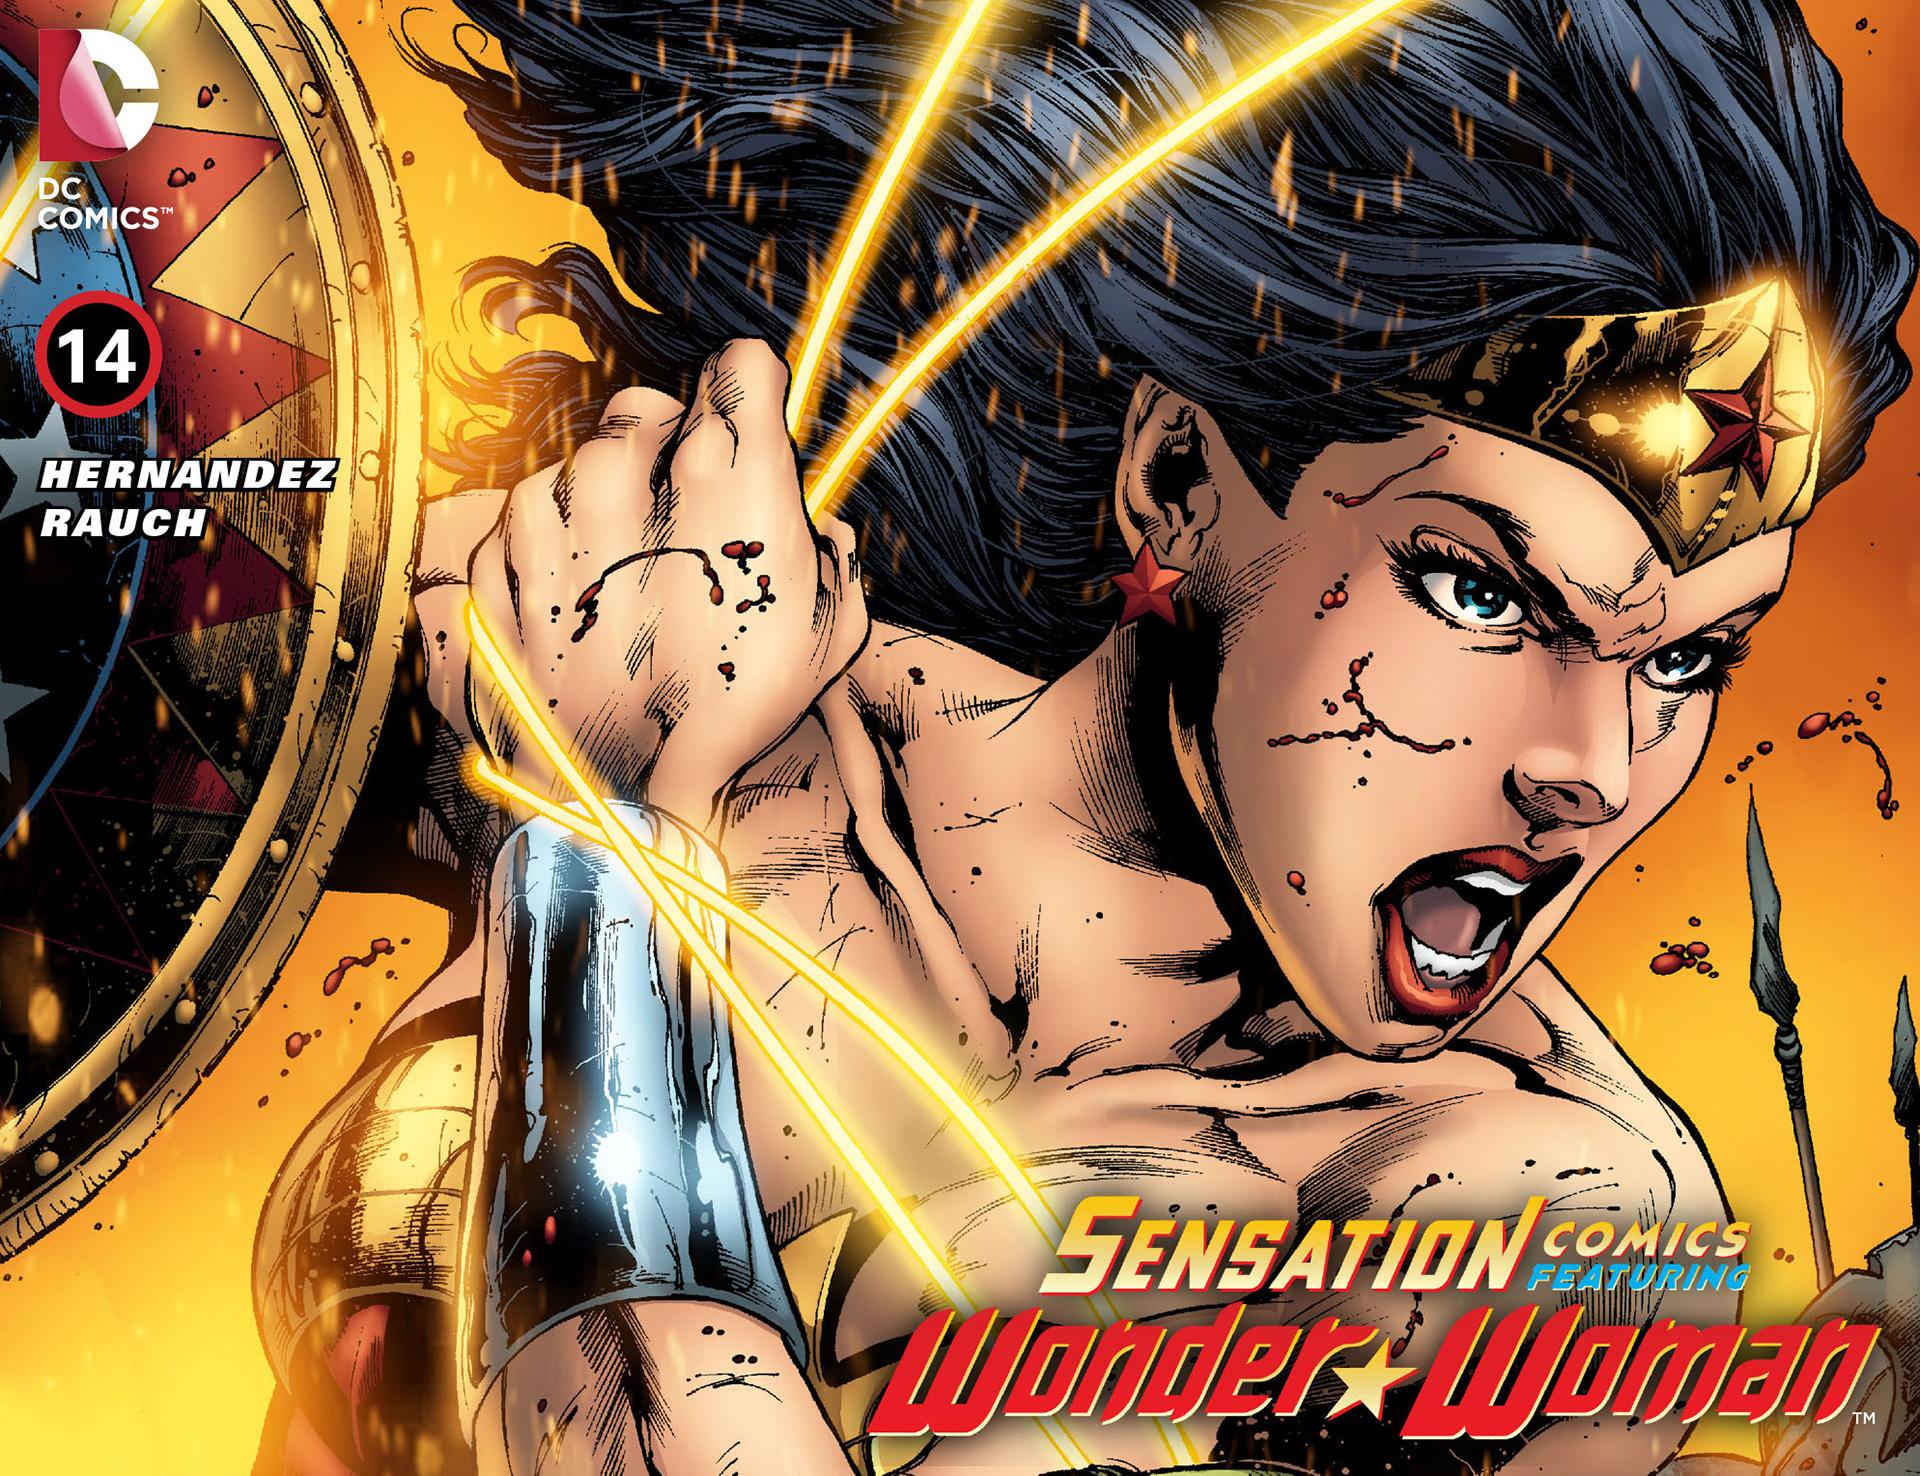 Read online Sensation Comics Featuring Wonder Woman comic -  Issue #14 - 1